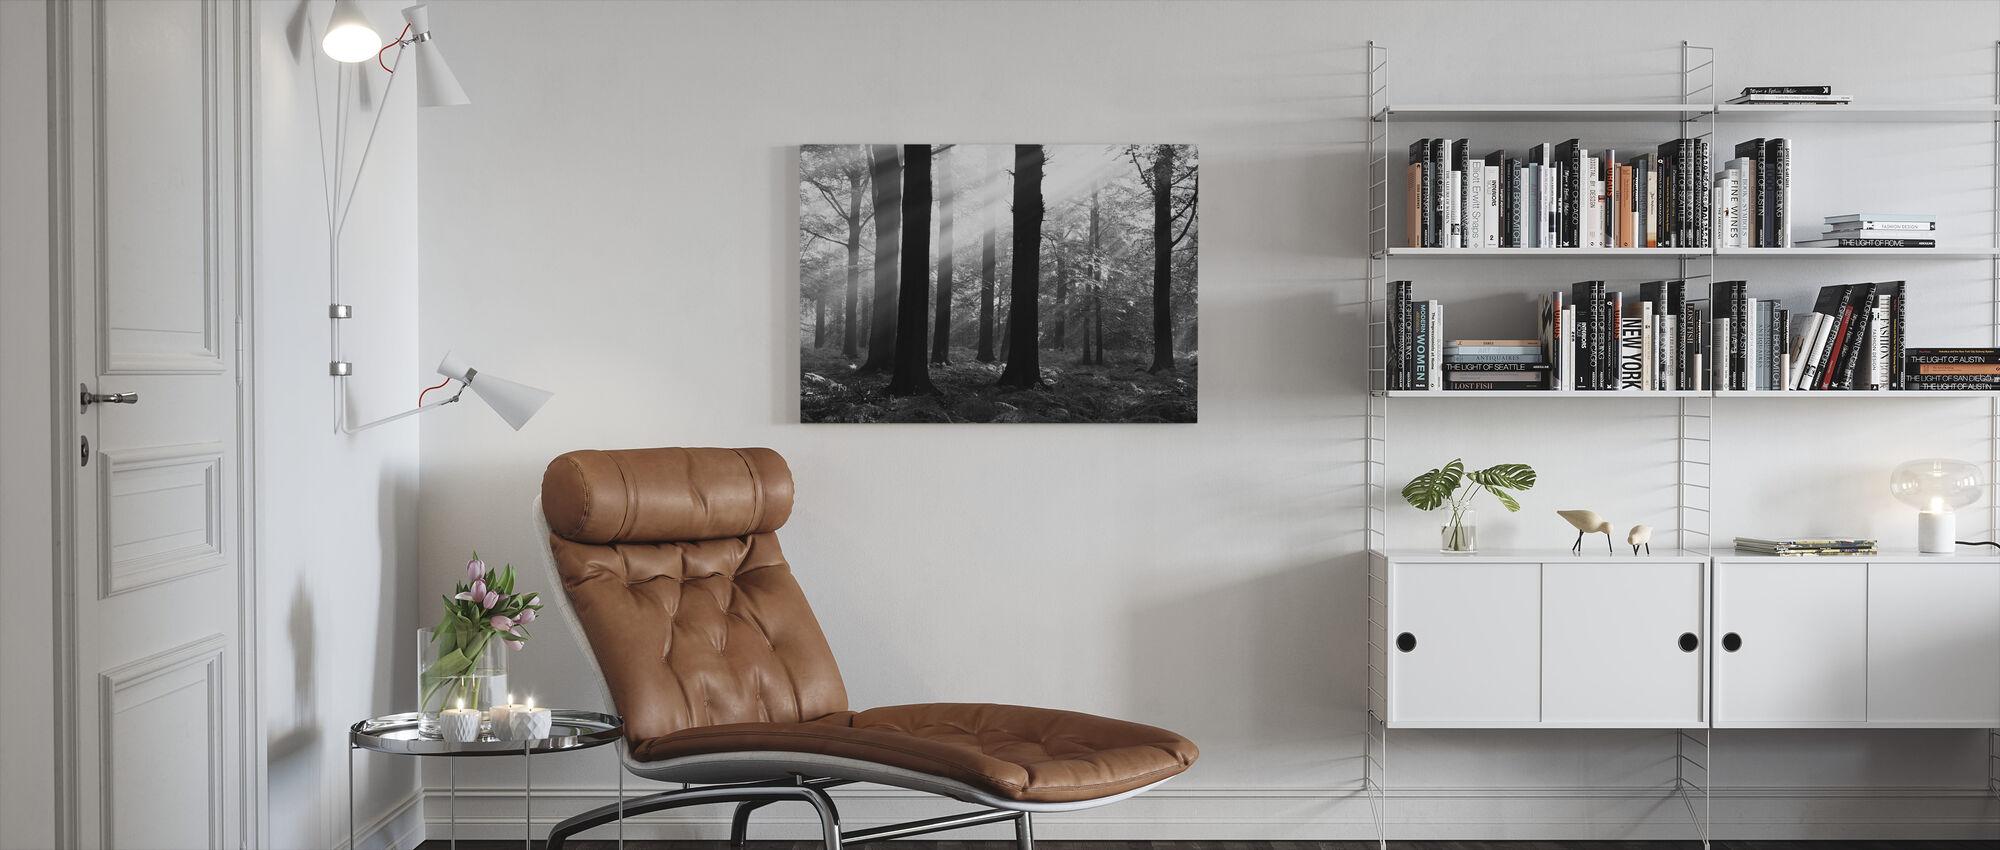 Morning Sunshine - b/w - Canvas print - Living Room